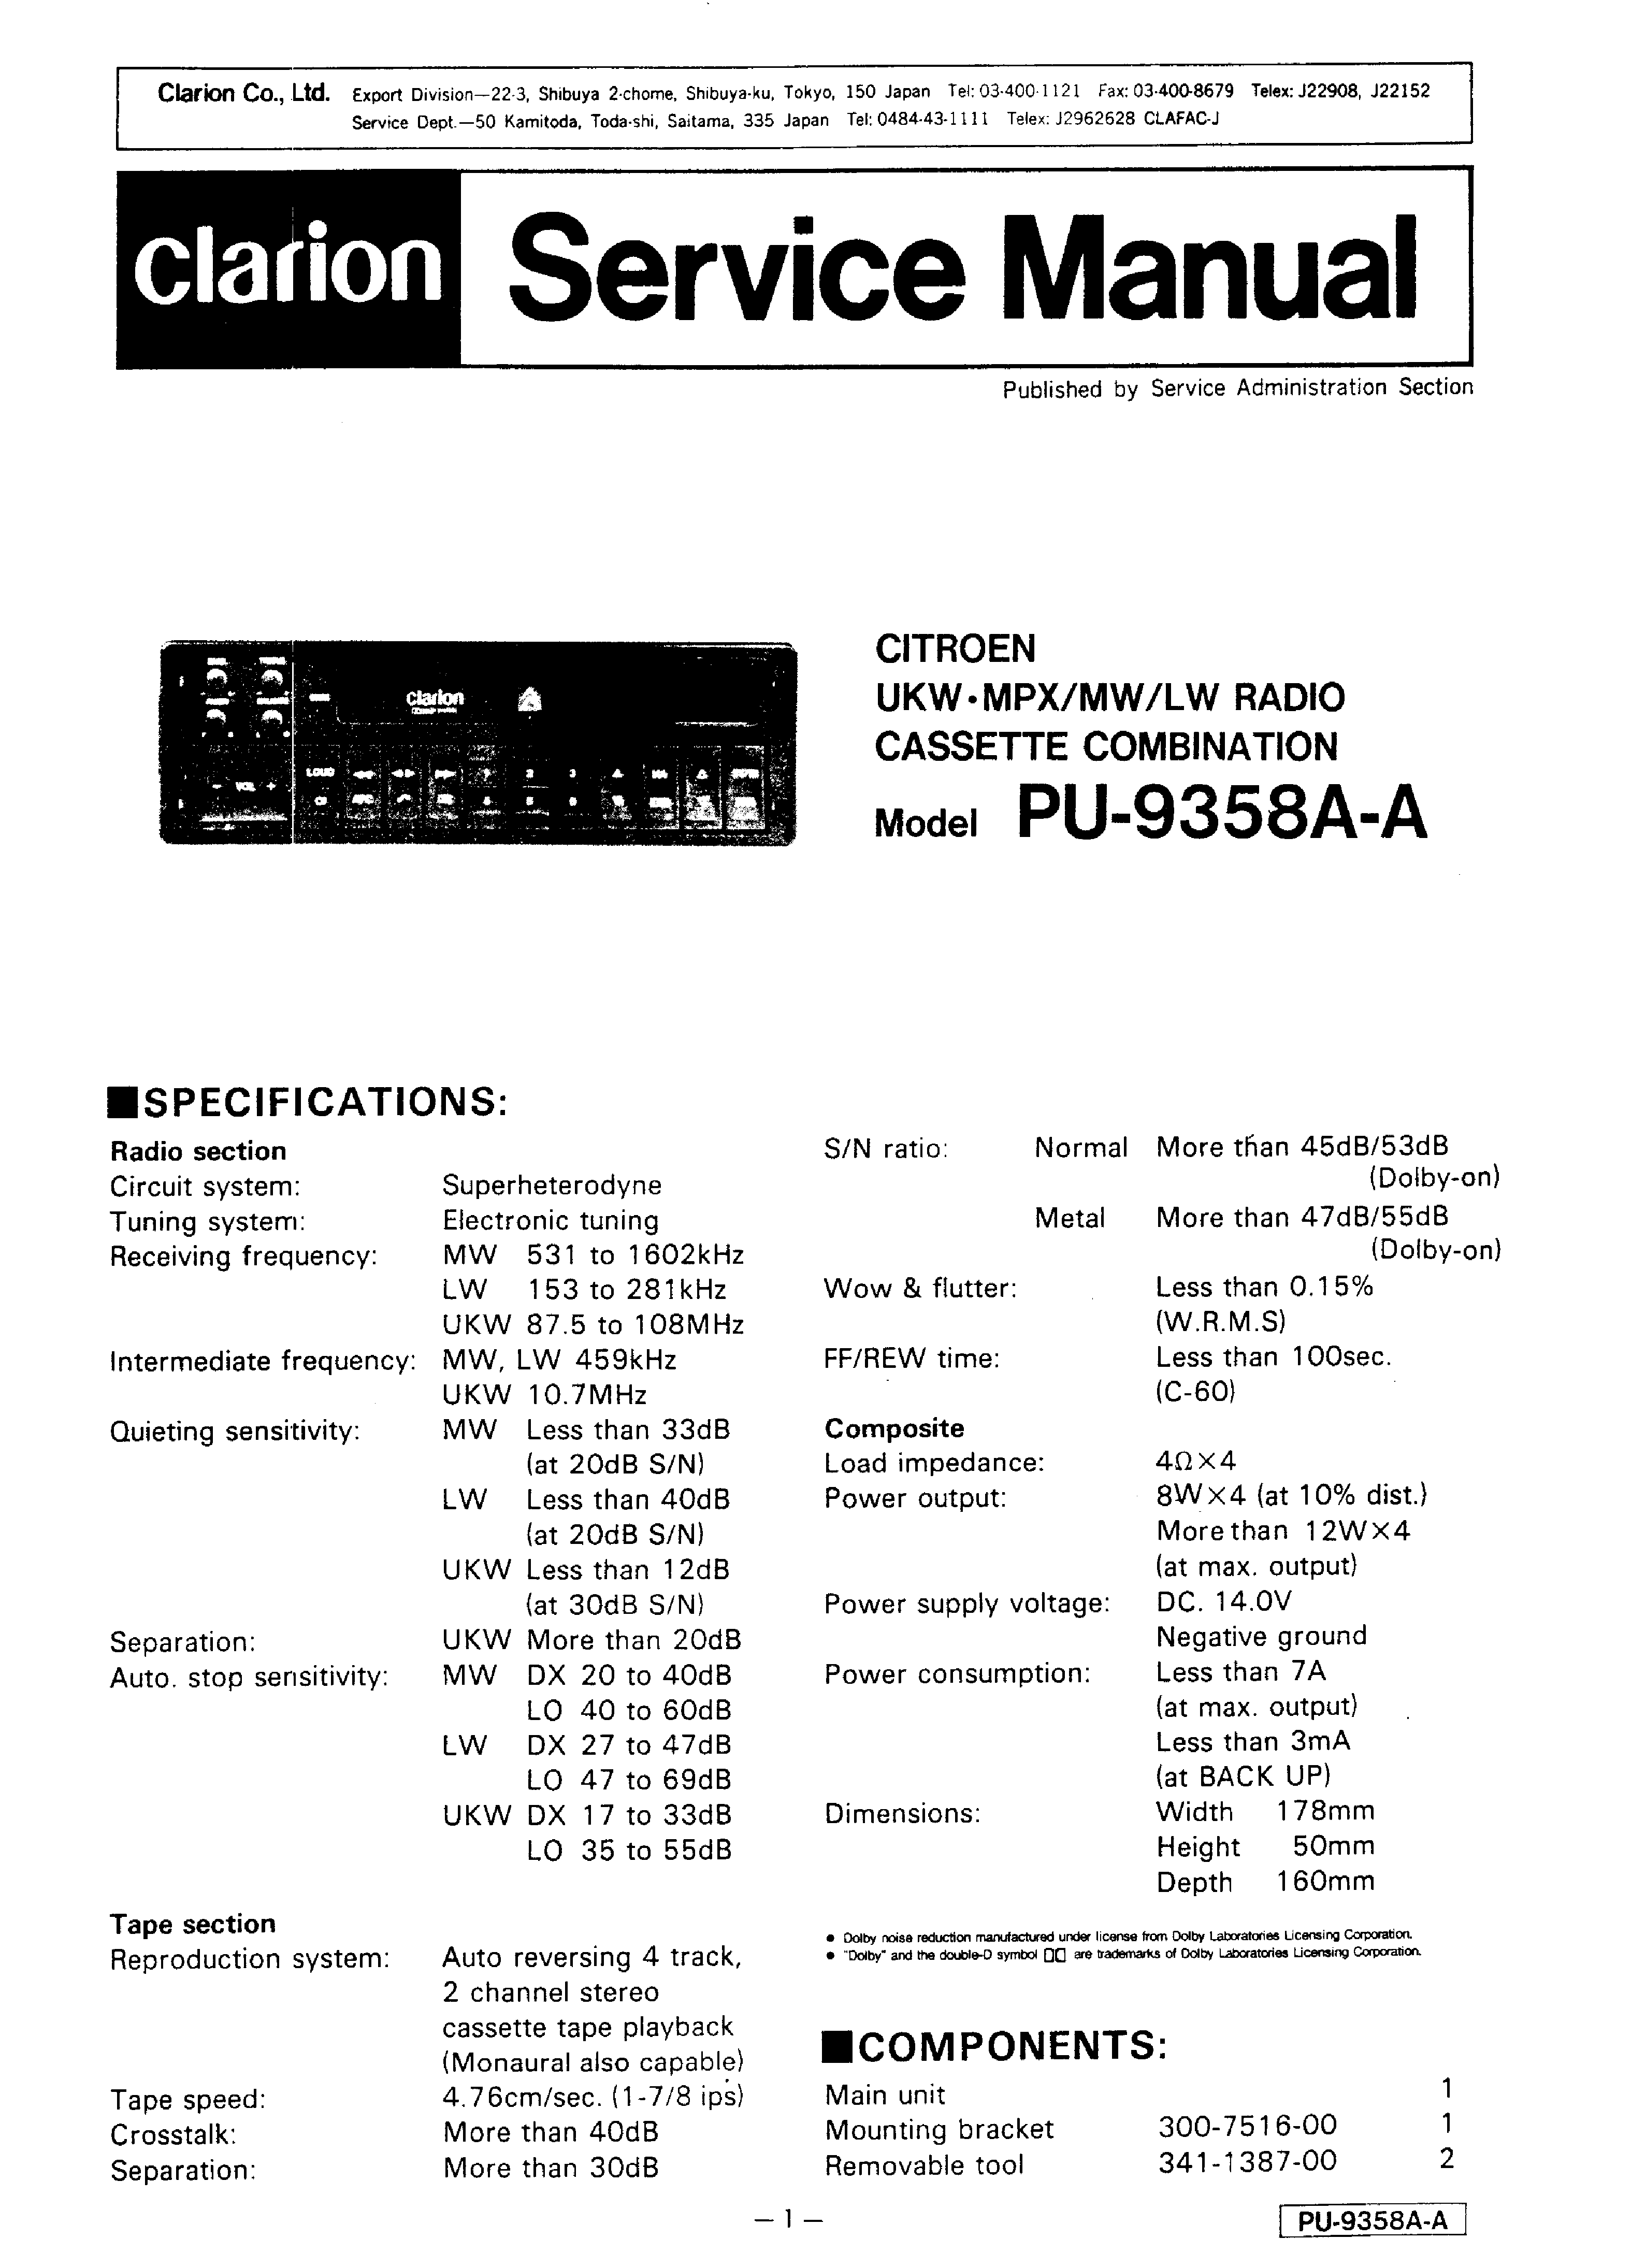 citroen xm forum view topic clarion pu 9358 grey service manual lifier repair